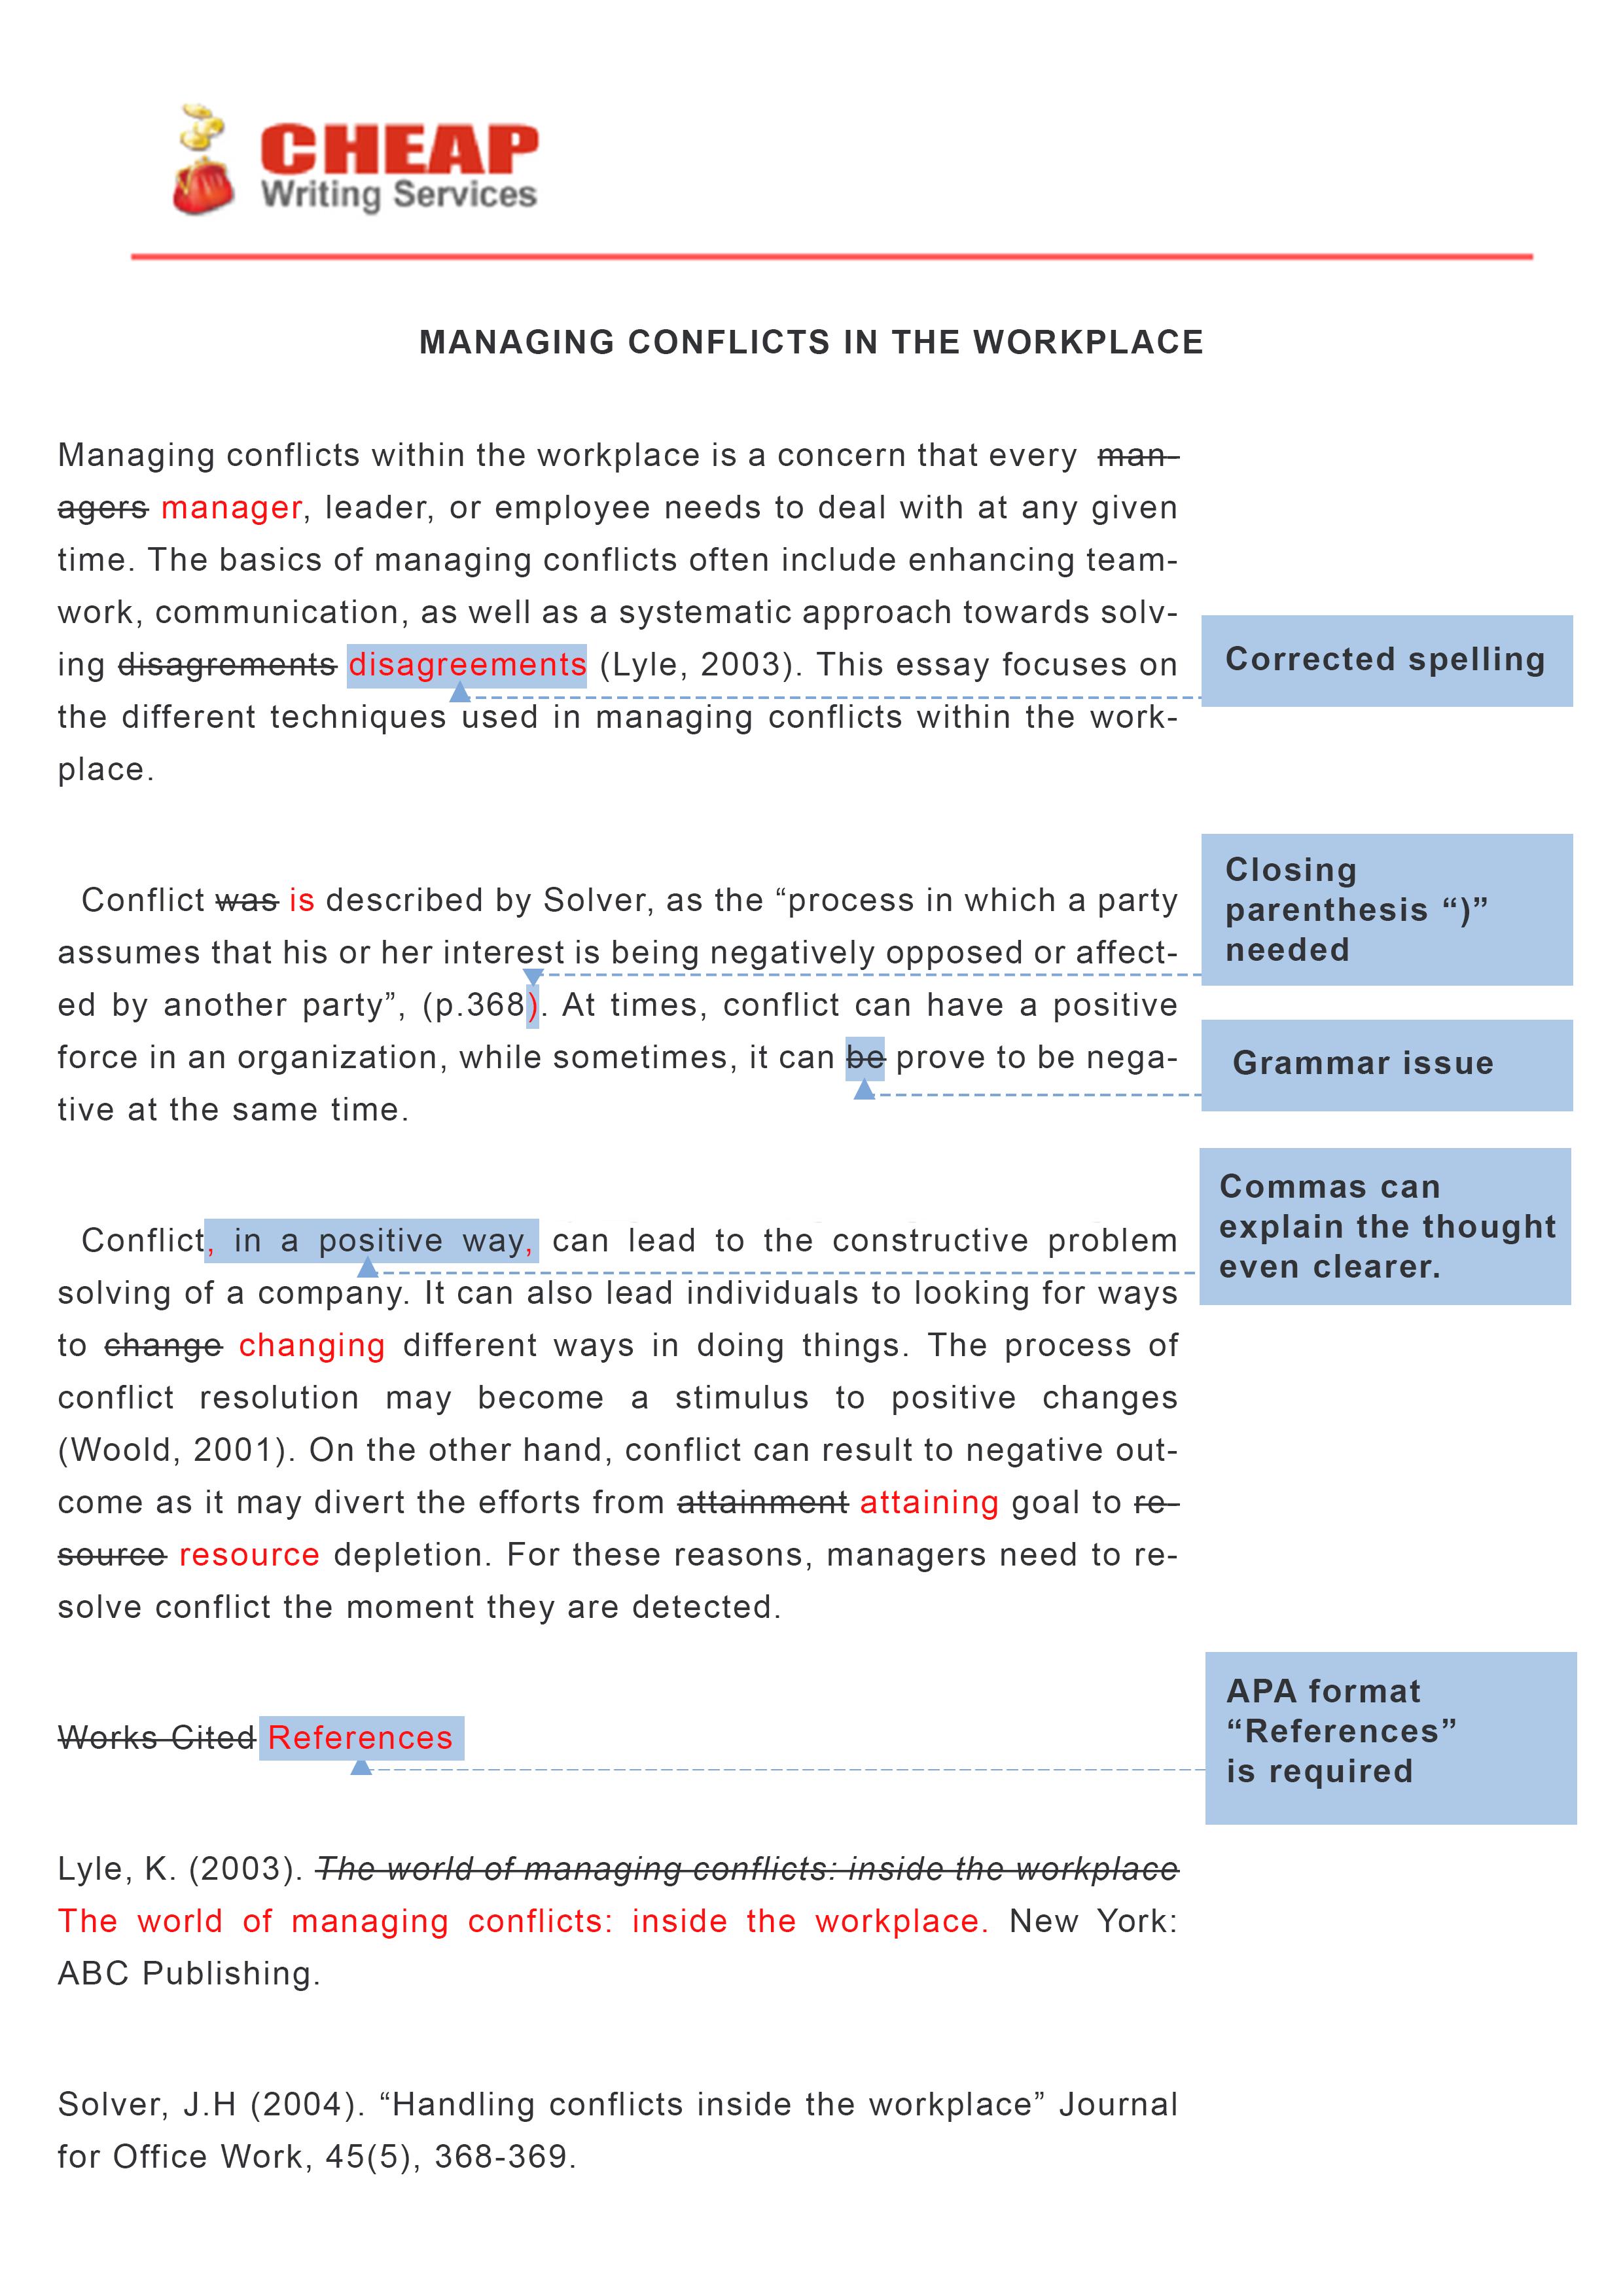 003 Essay Example Editing Cheap Top Writing Service Canada Australia Reviews Full